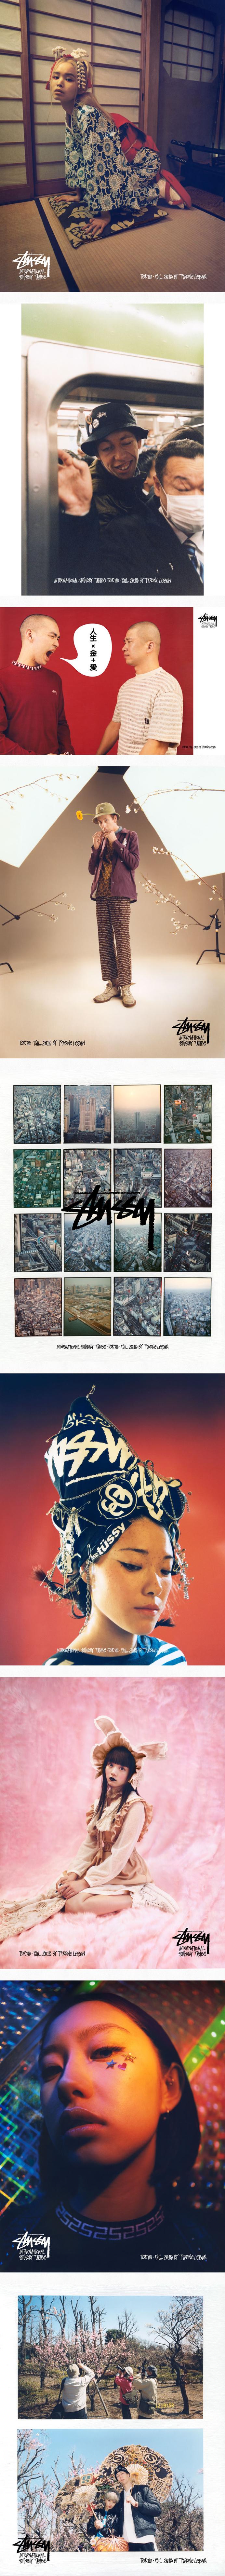 Tokyo – Stüssy Fall 2015 by Tyrone Lebon